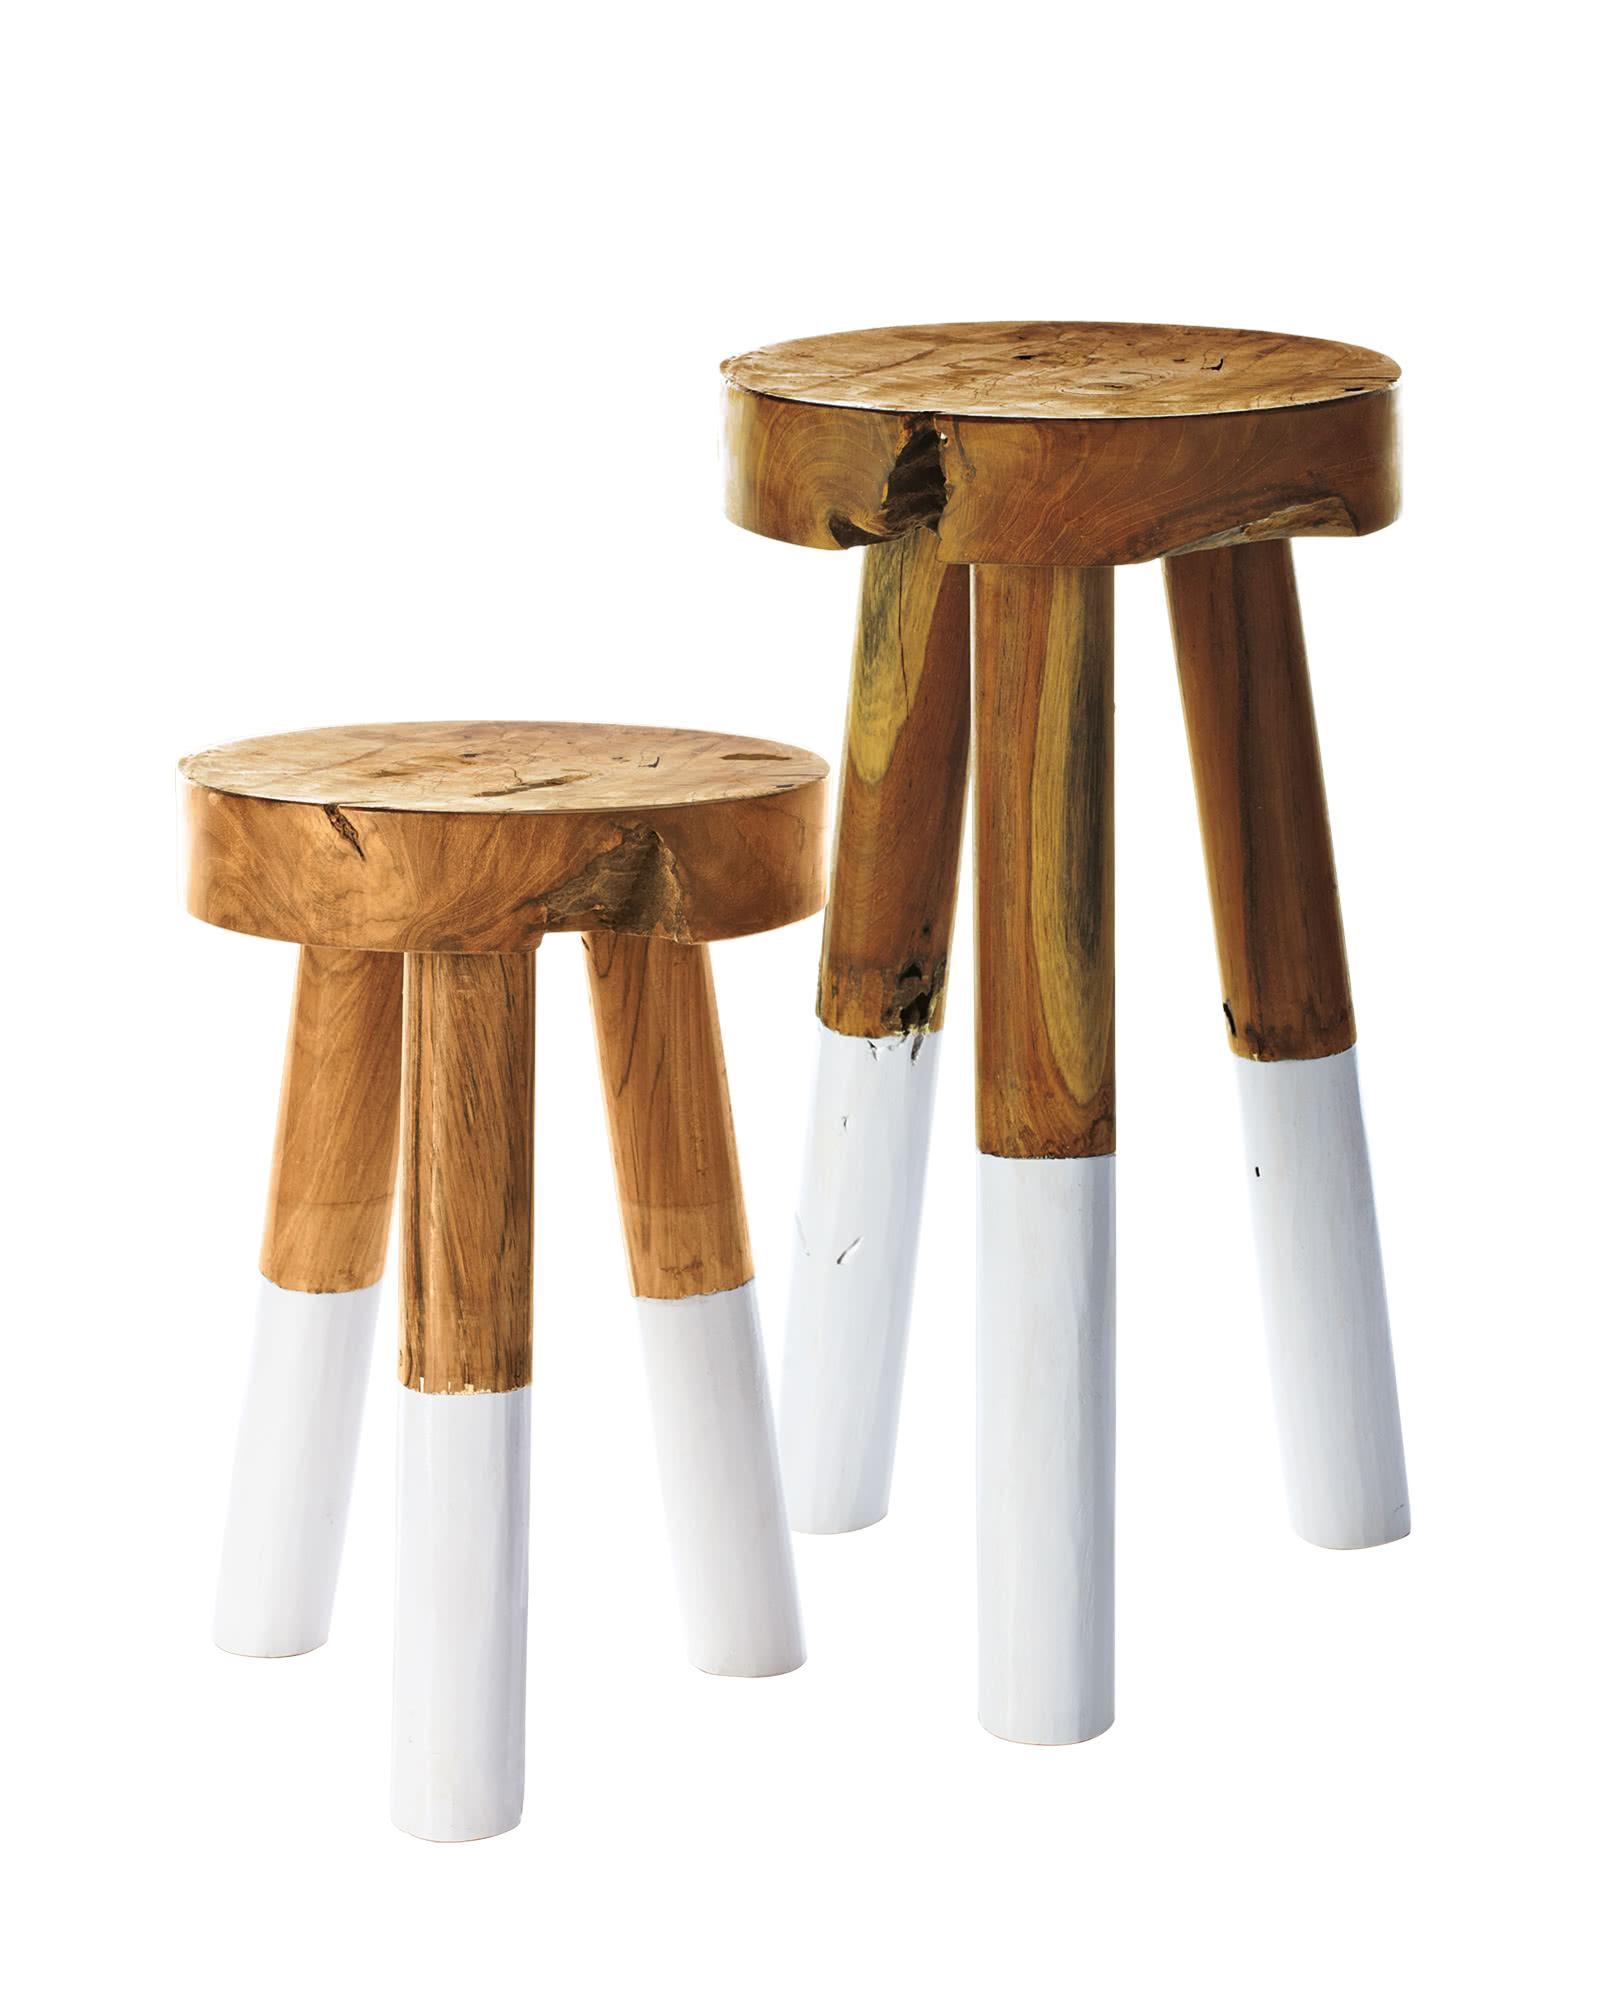 Dip-Dyed Teak Wood Stools